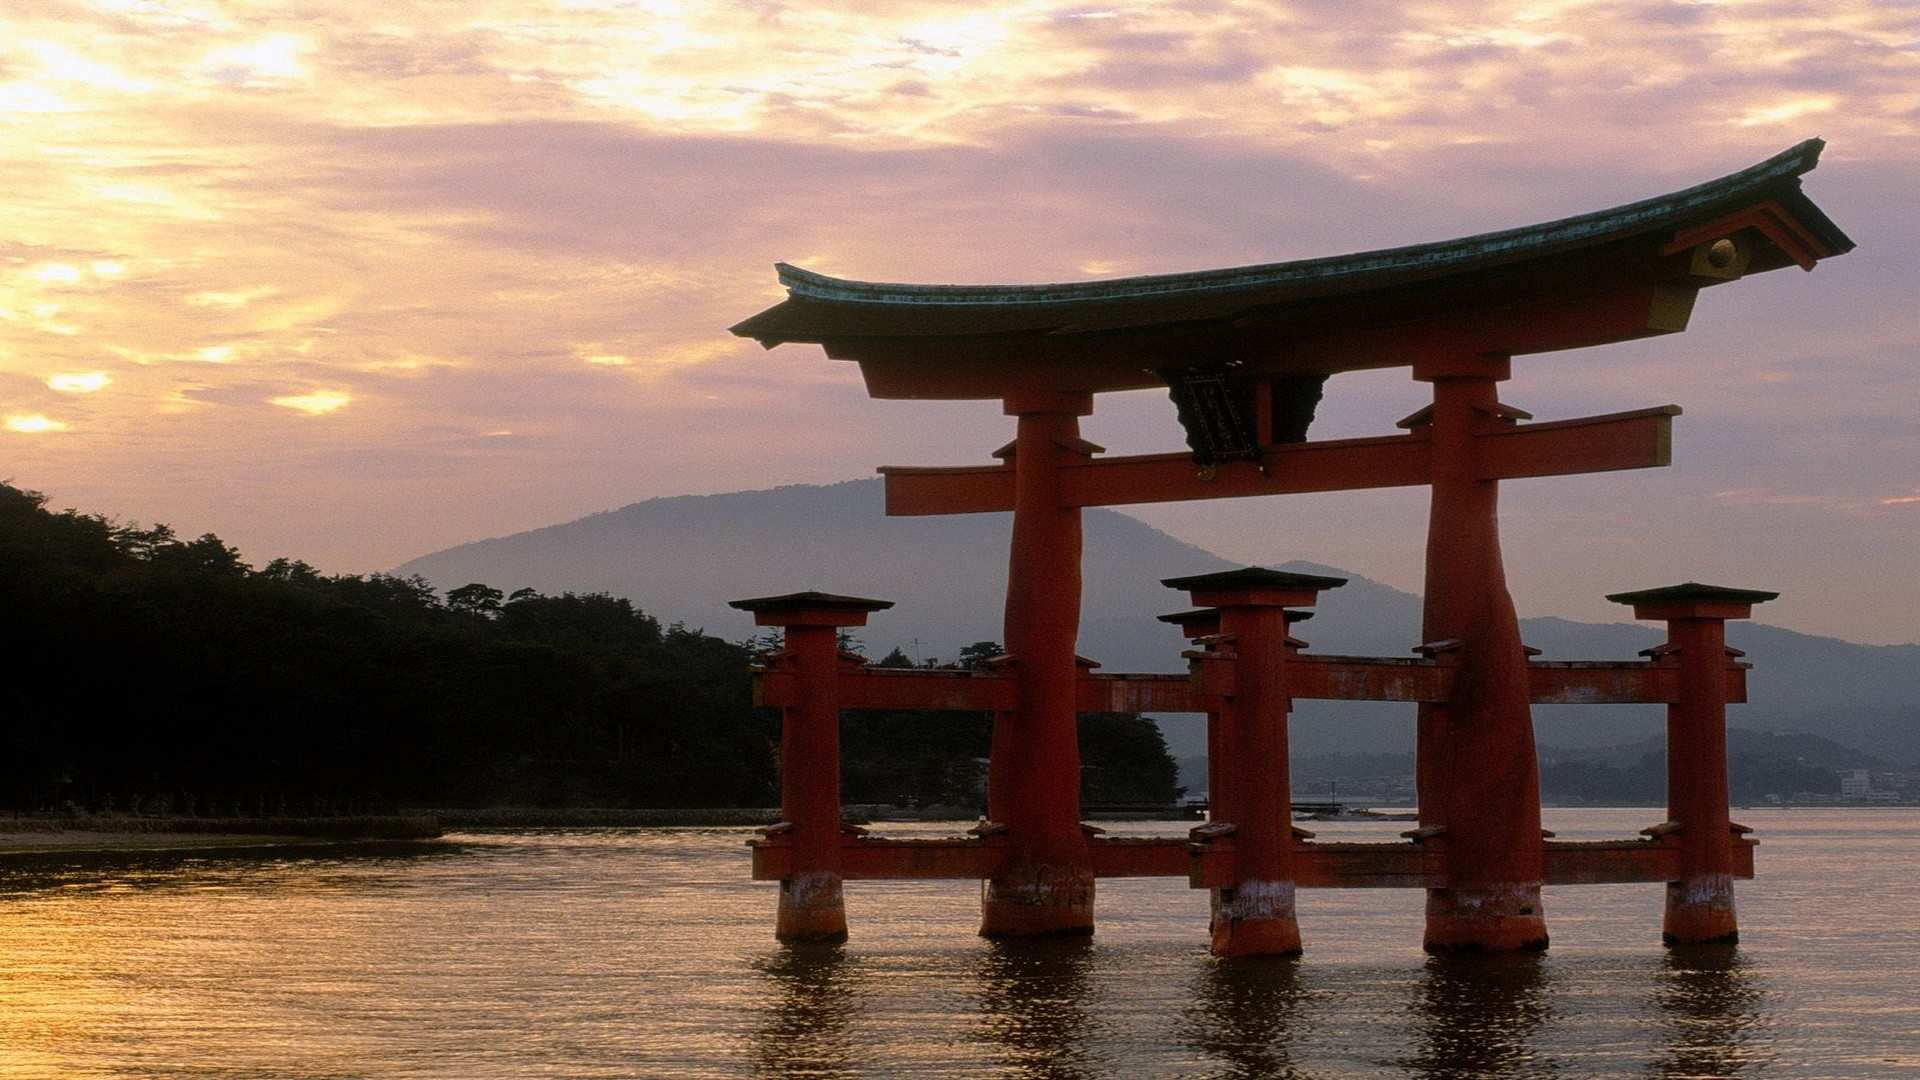 Miyajima Shrine At Sunset Japan Temple Architecture Lakes Water Reflection Asian Oriental Shore Trees Forest Mountain Jungle Zen Wallpaper